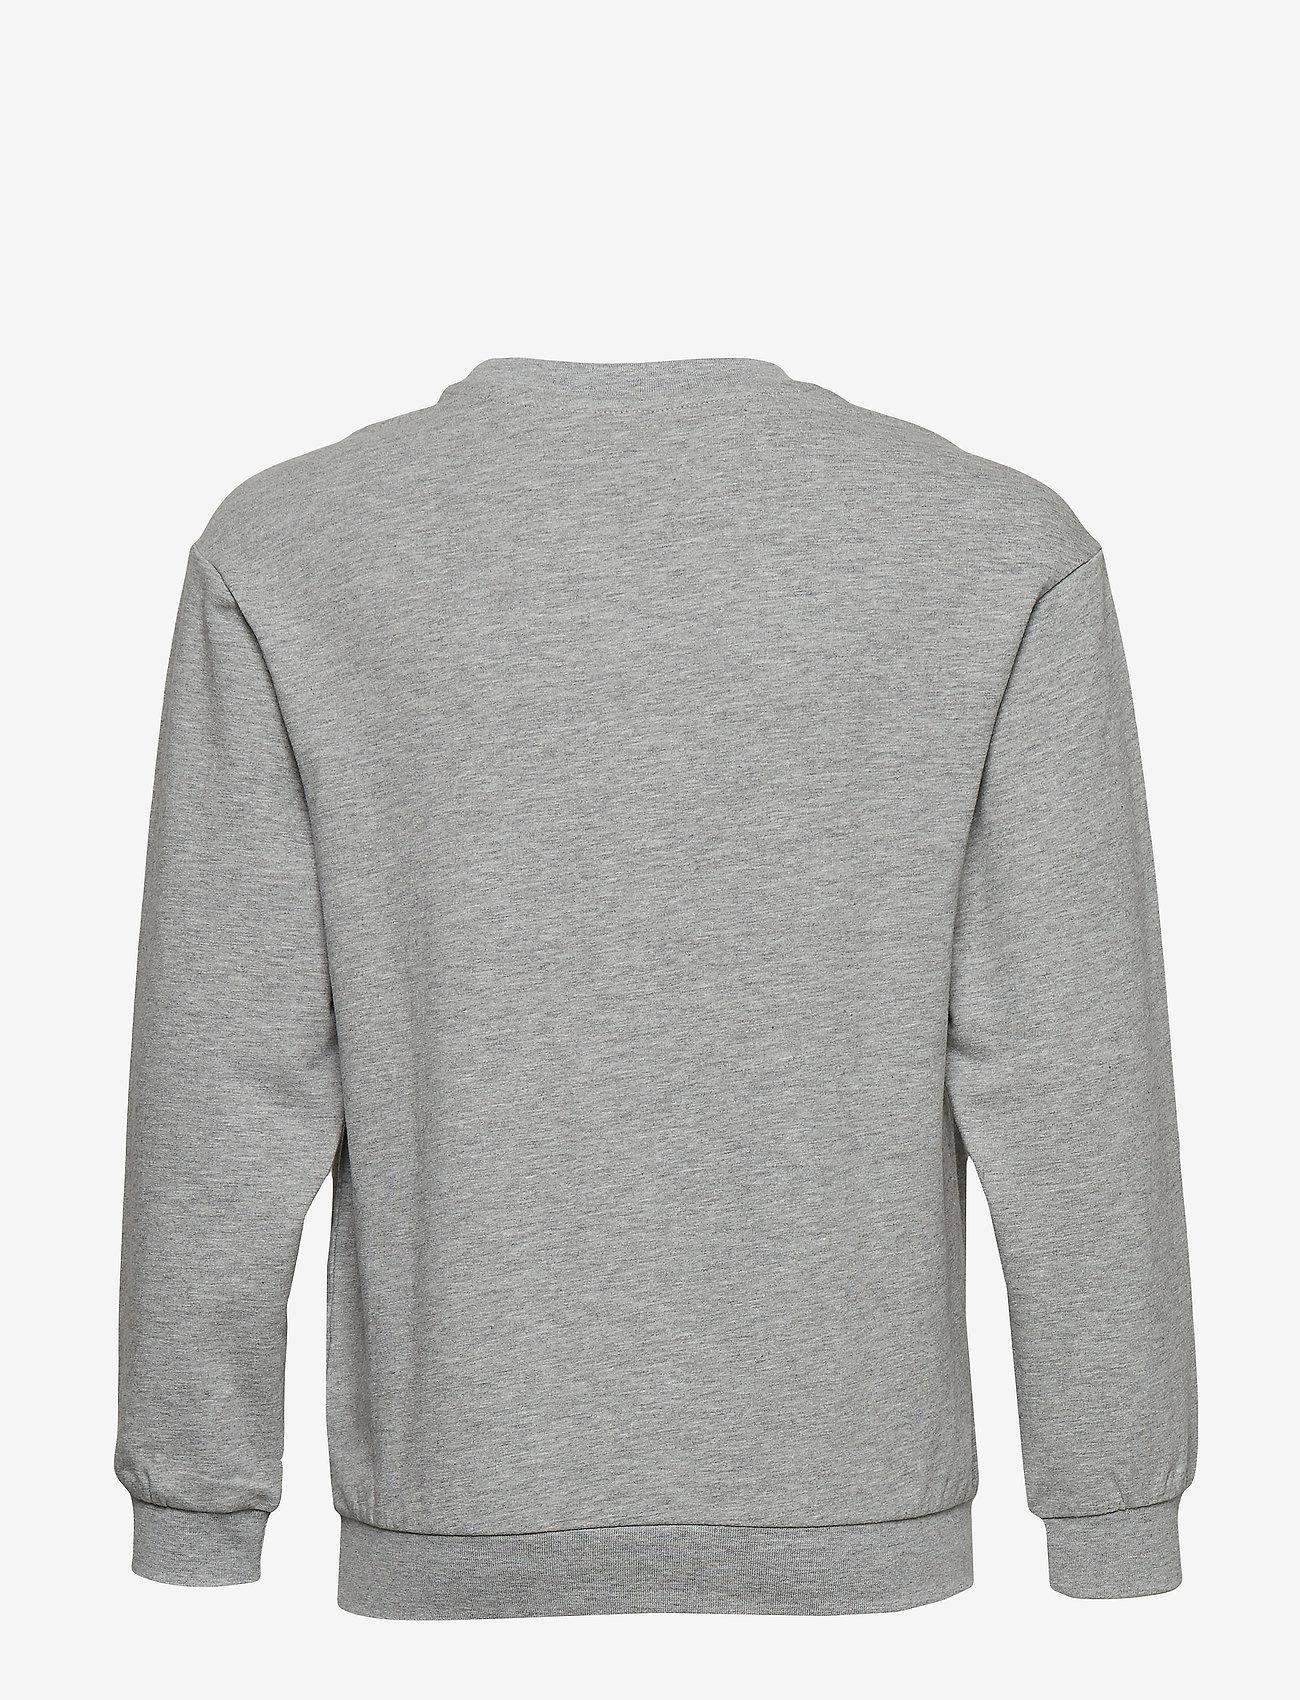 Hummel - HMLDOS SWEATSHIRT - sweatshirts - grey melange - 1